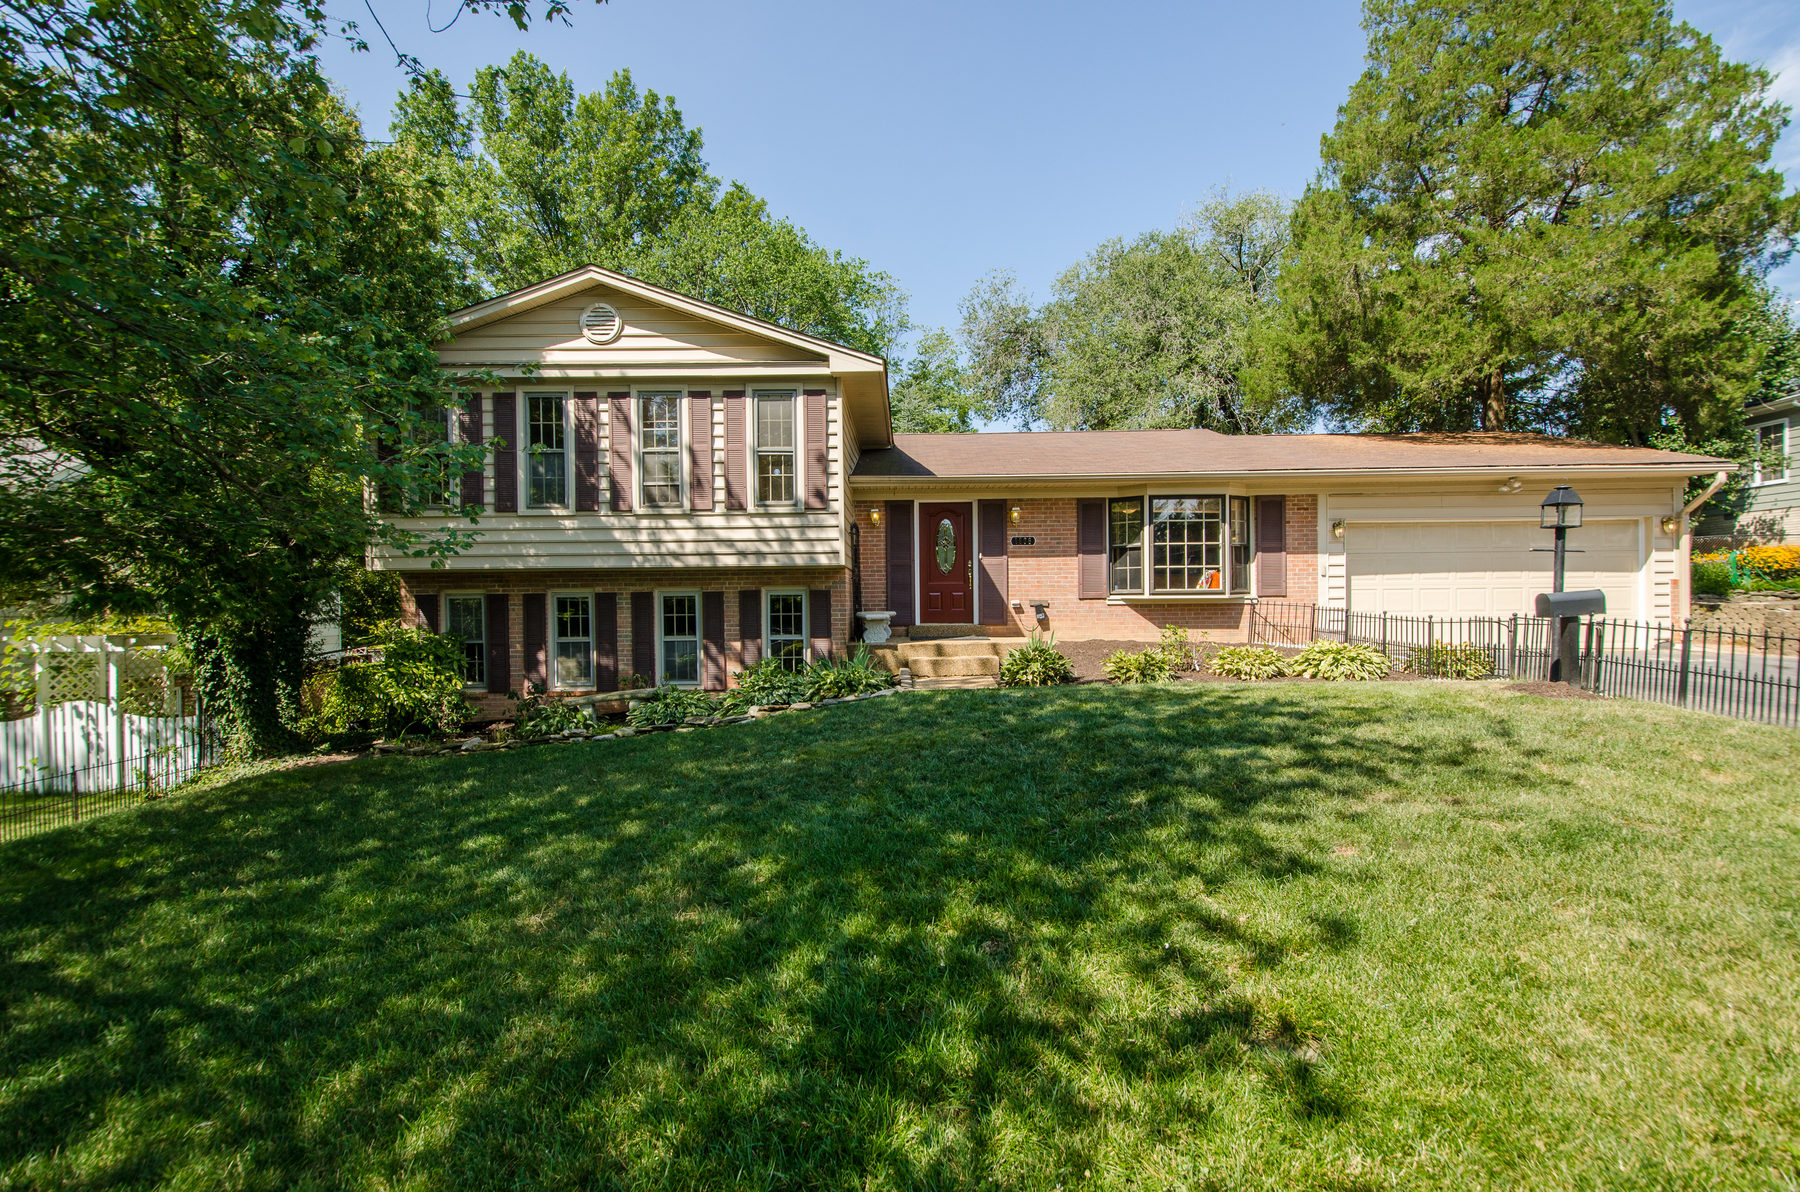 Villa per Vendita alle ore 1906 Great Falls Street, Mclean McLean, Virginia 22101 Stati Uniti